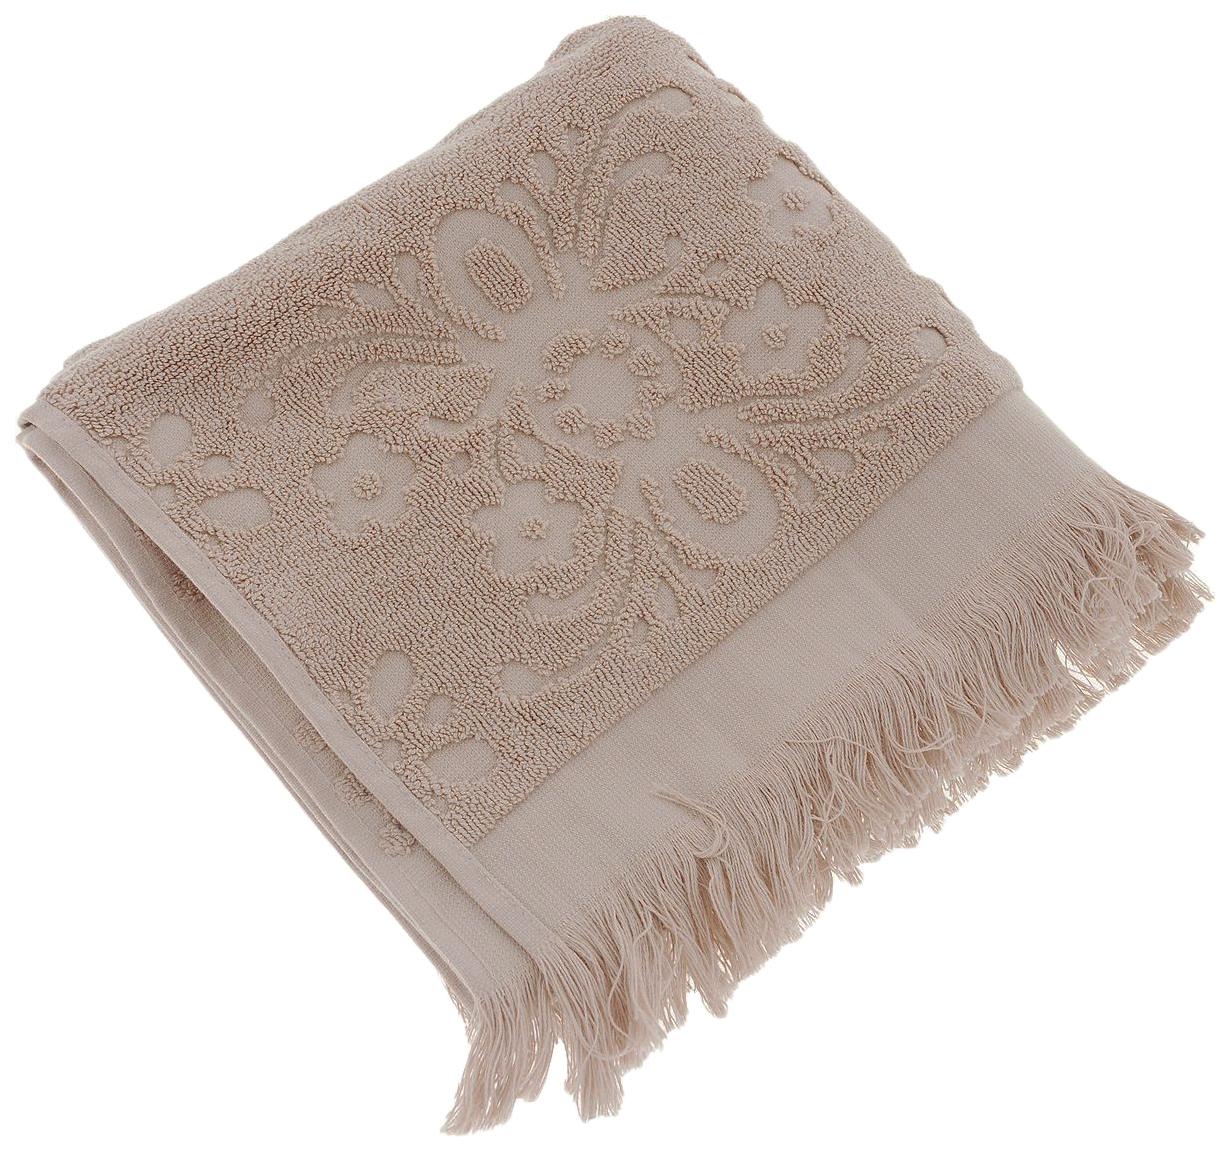 Банное полотенце, полотенце универсальное Arya бежевый